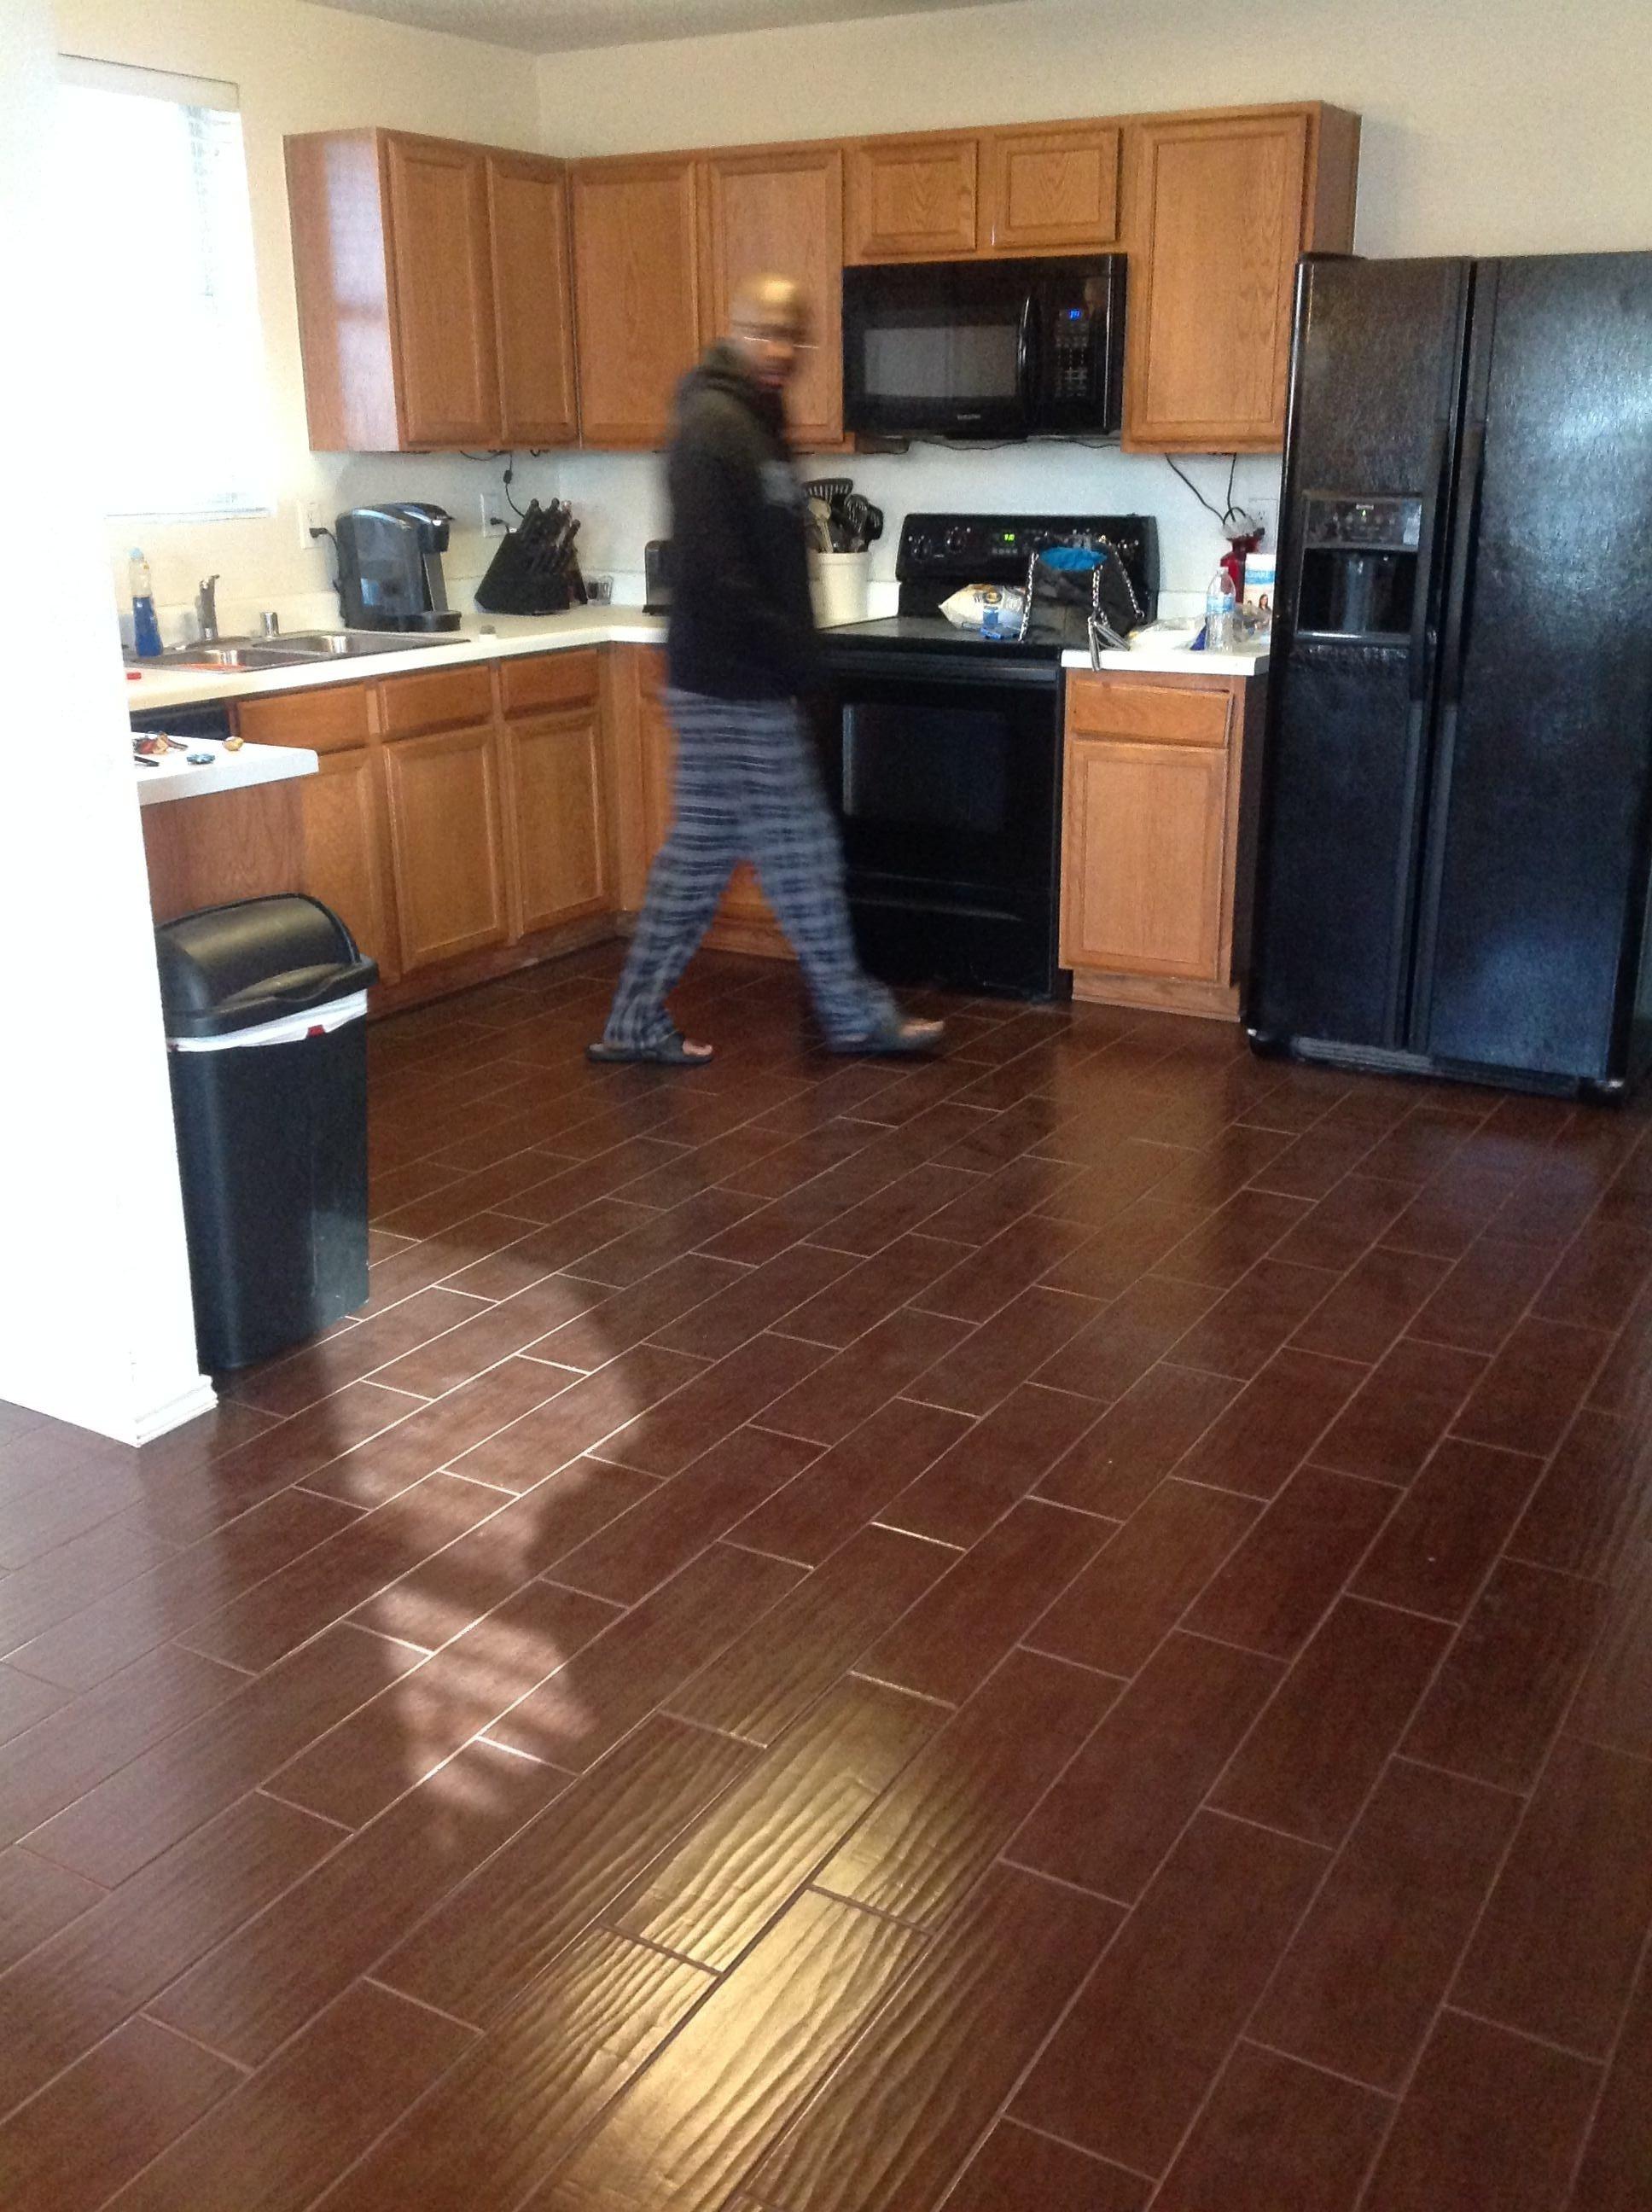 New Wood Floors In Kitchen Vs Tile Floating Wood Floor Over Tile inside proportions 1936 X 2592